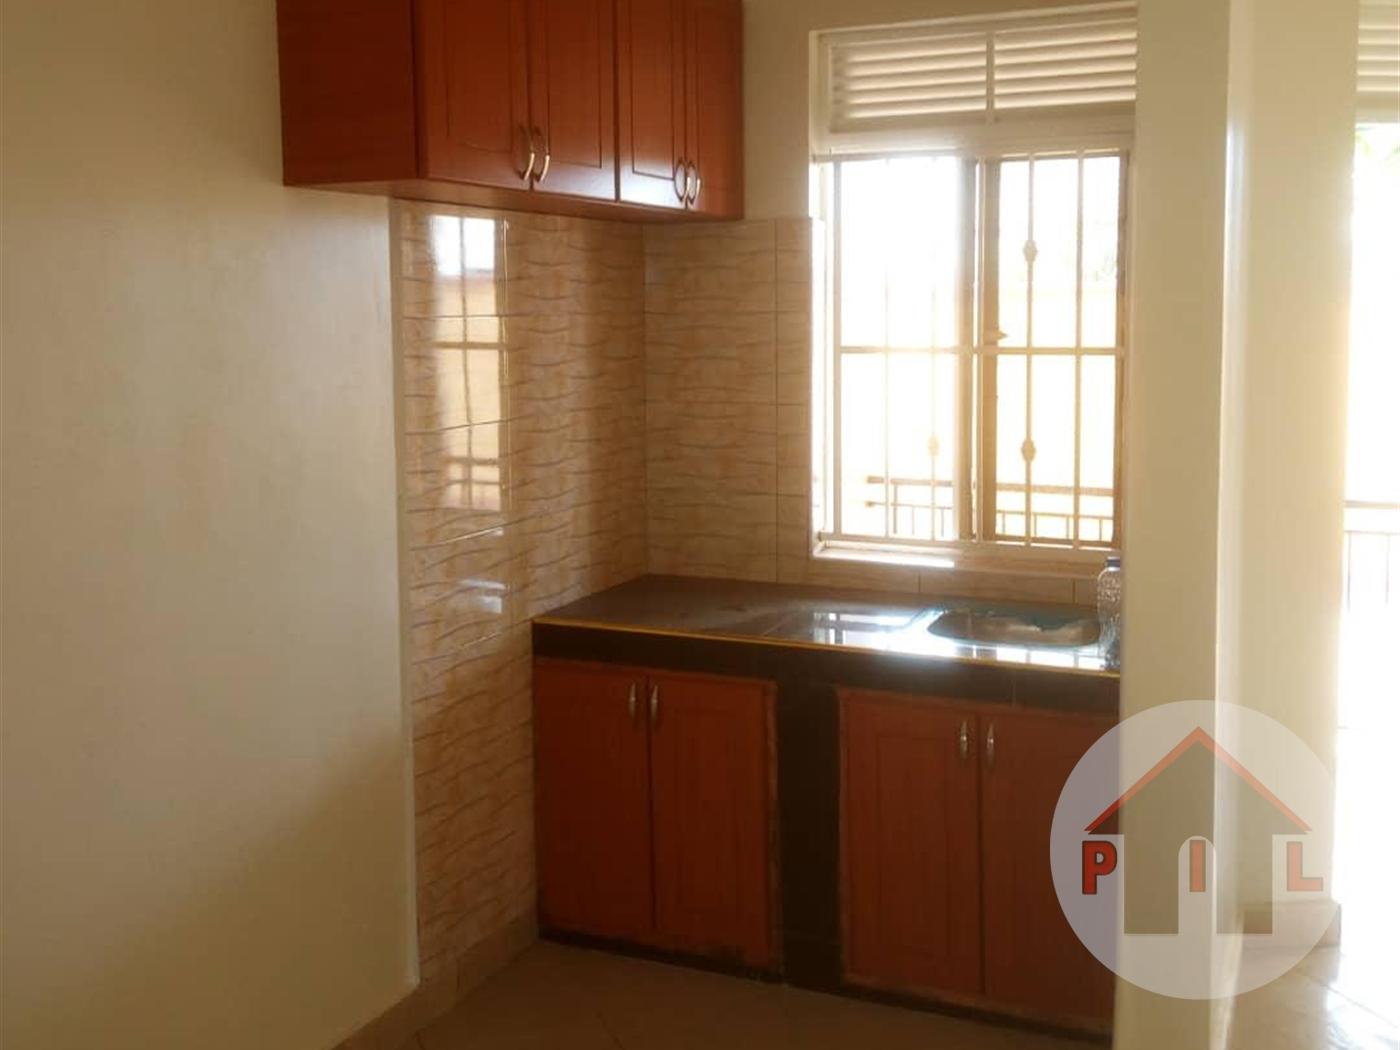 Rental units for rent in Kira Wakiso